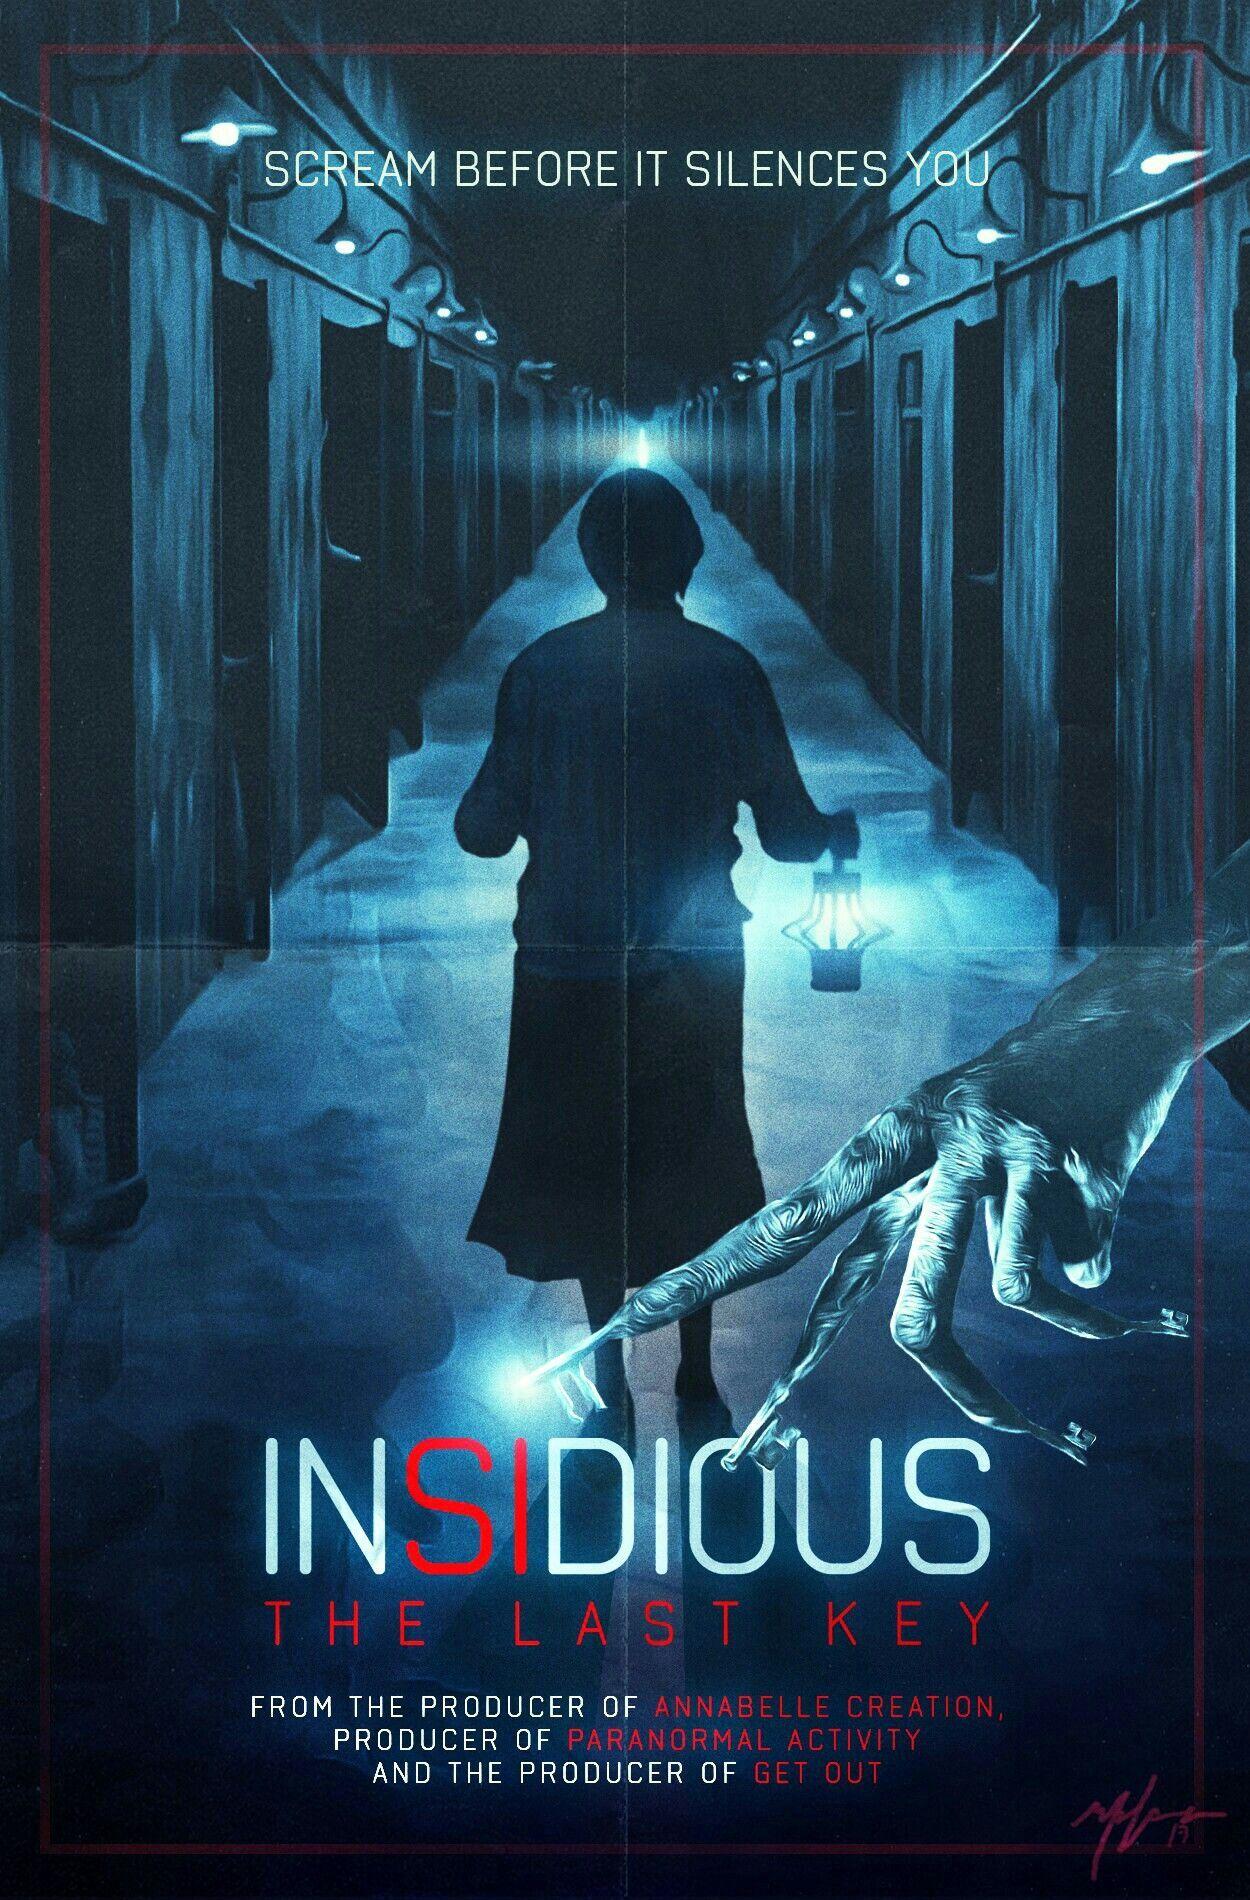 Insidious 5 2020 Online Subtitrat In Romana In 2020 Insidious Movie Insidious Paranormal Activity